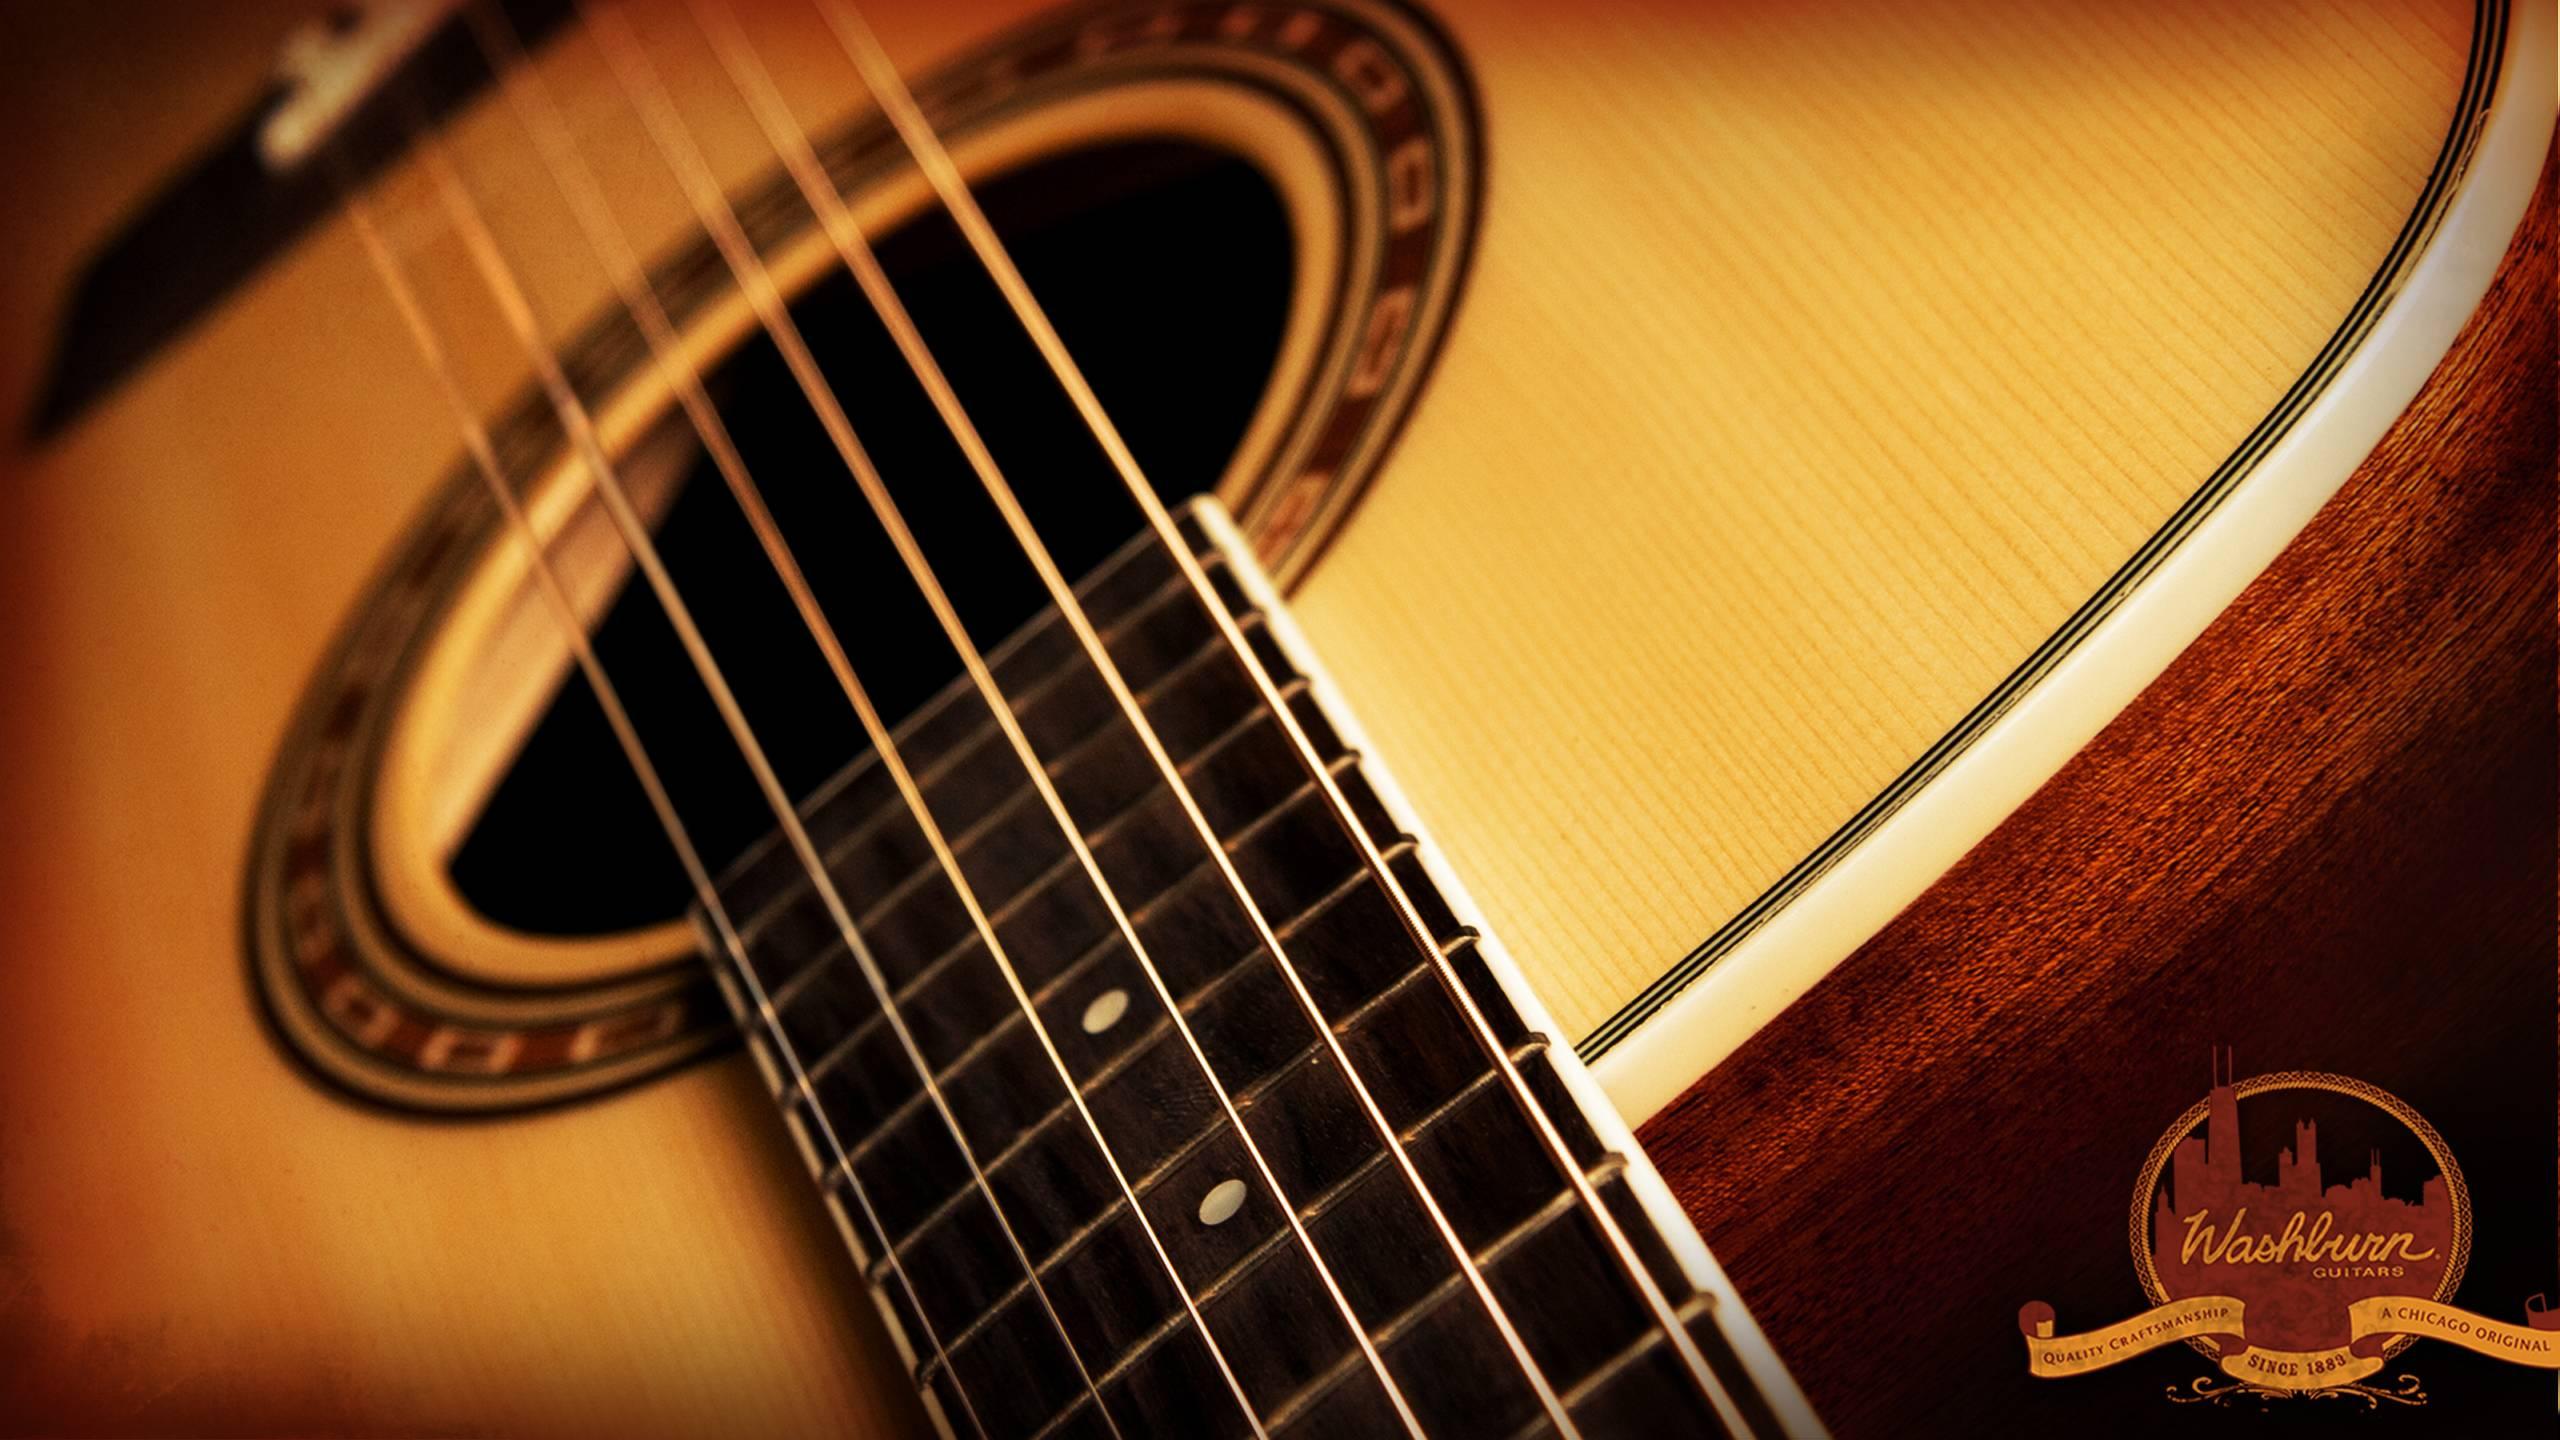 Beautiful Wallpaper Music Cell Phone - 3D-Guitar-Wallpapers-041  Image_587574.jpg